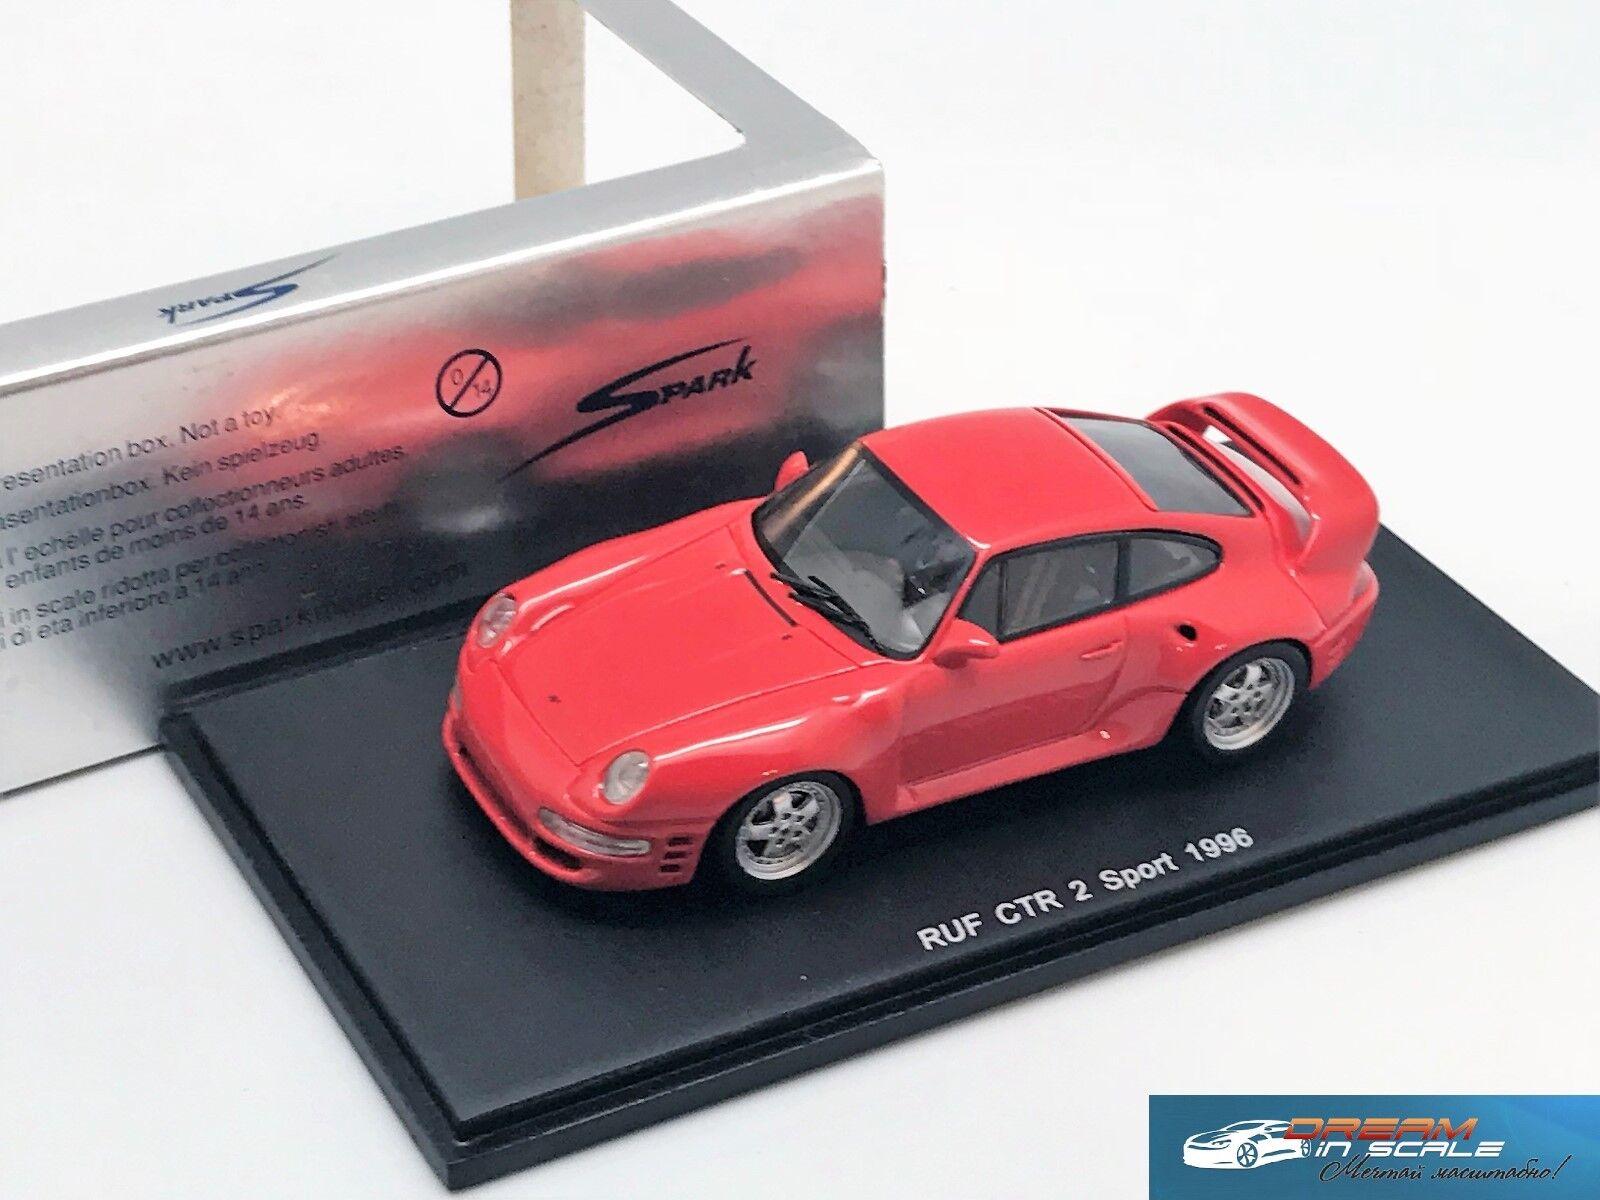 Porsche RUF CTR 2 Sport  rosso Spark S0724  resin 1 43